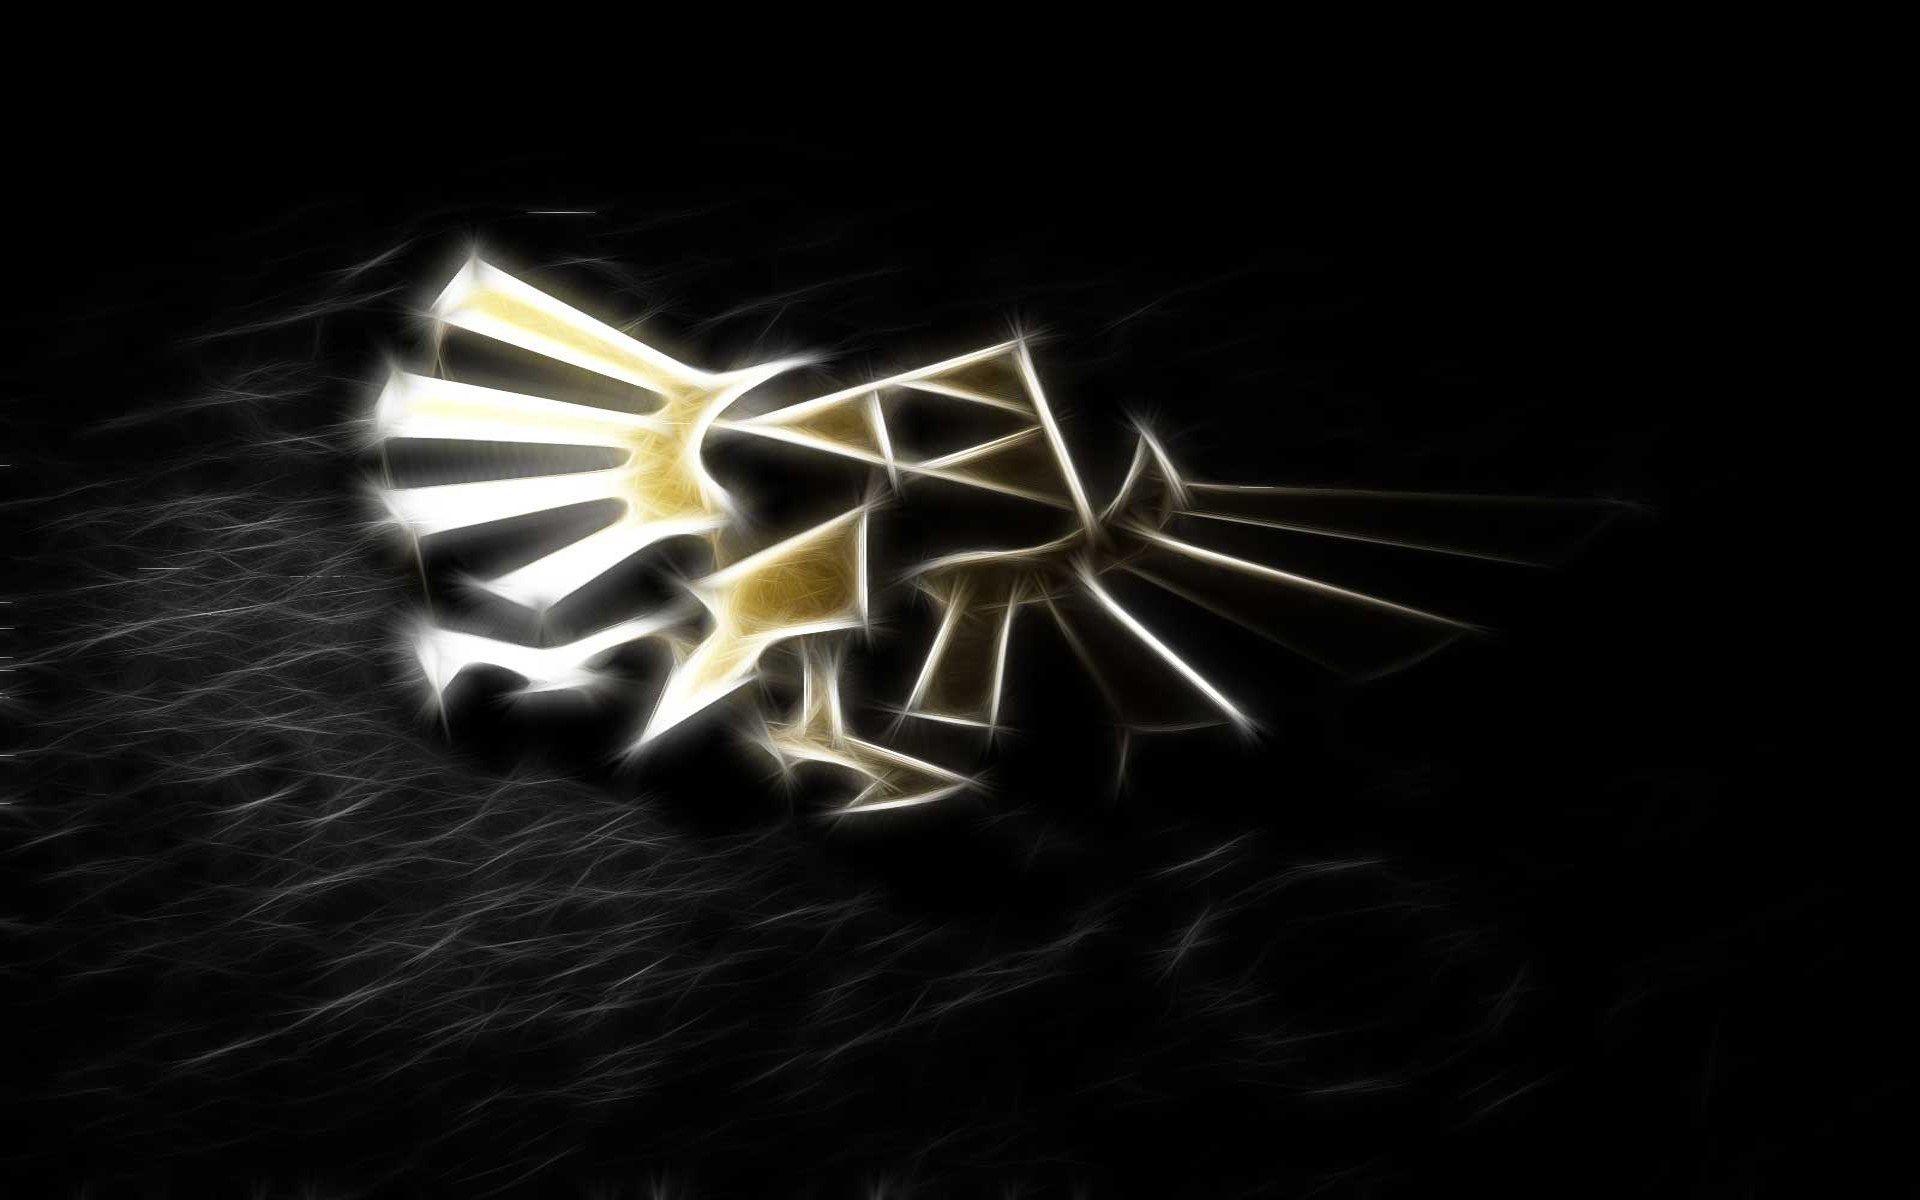 logo legend of zelda wallpaper hd ololoshenka Gold